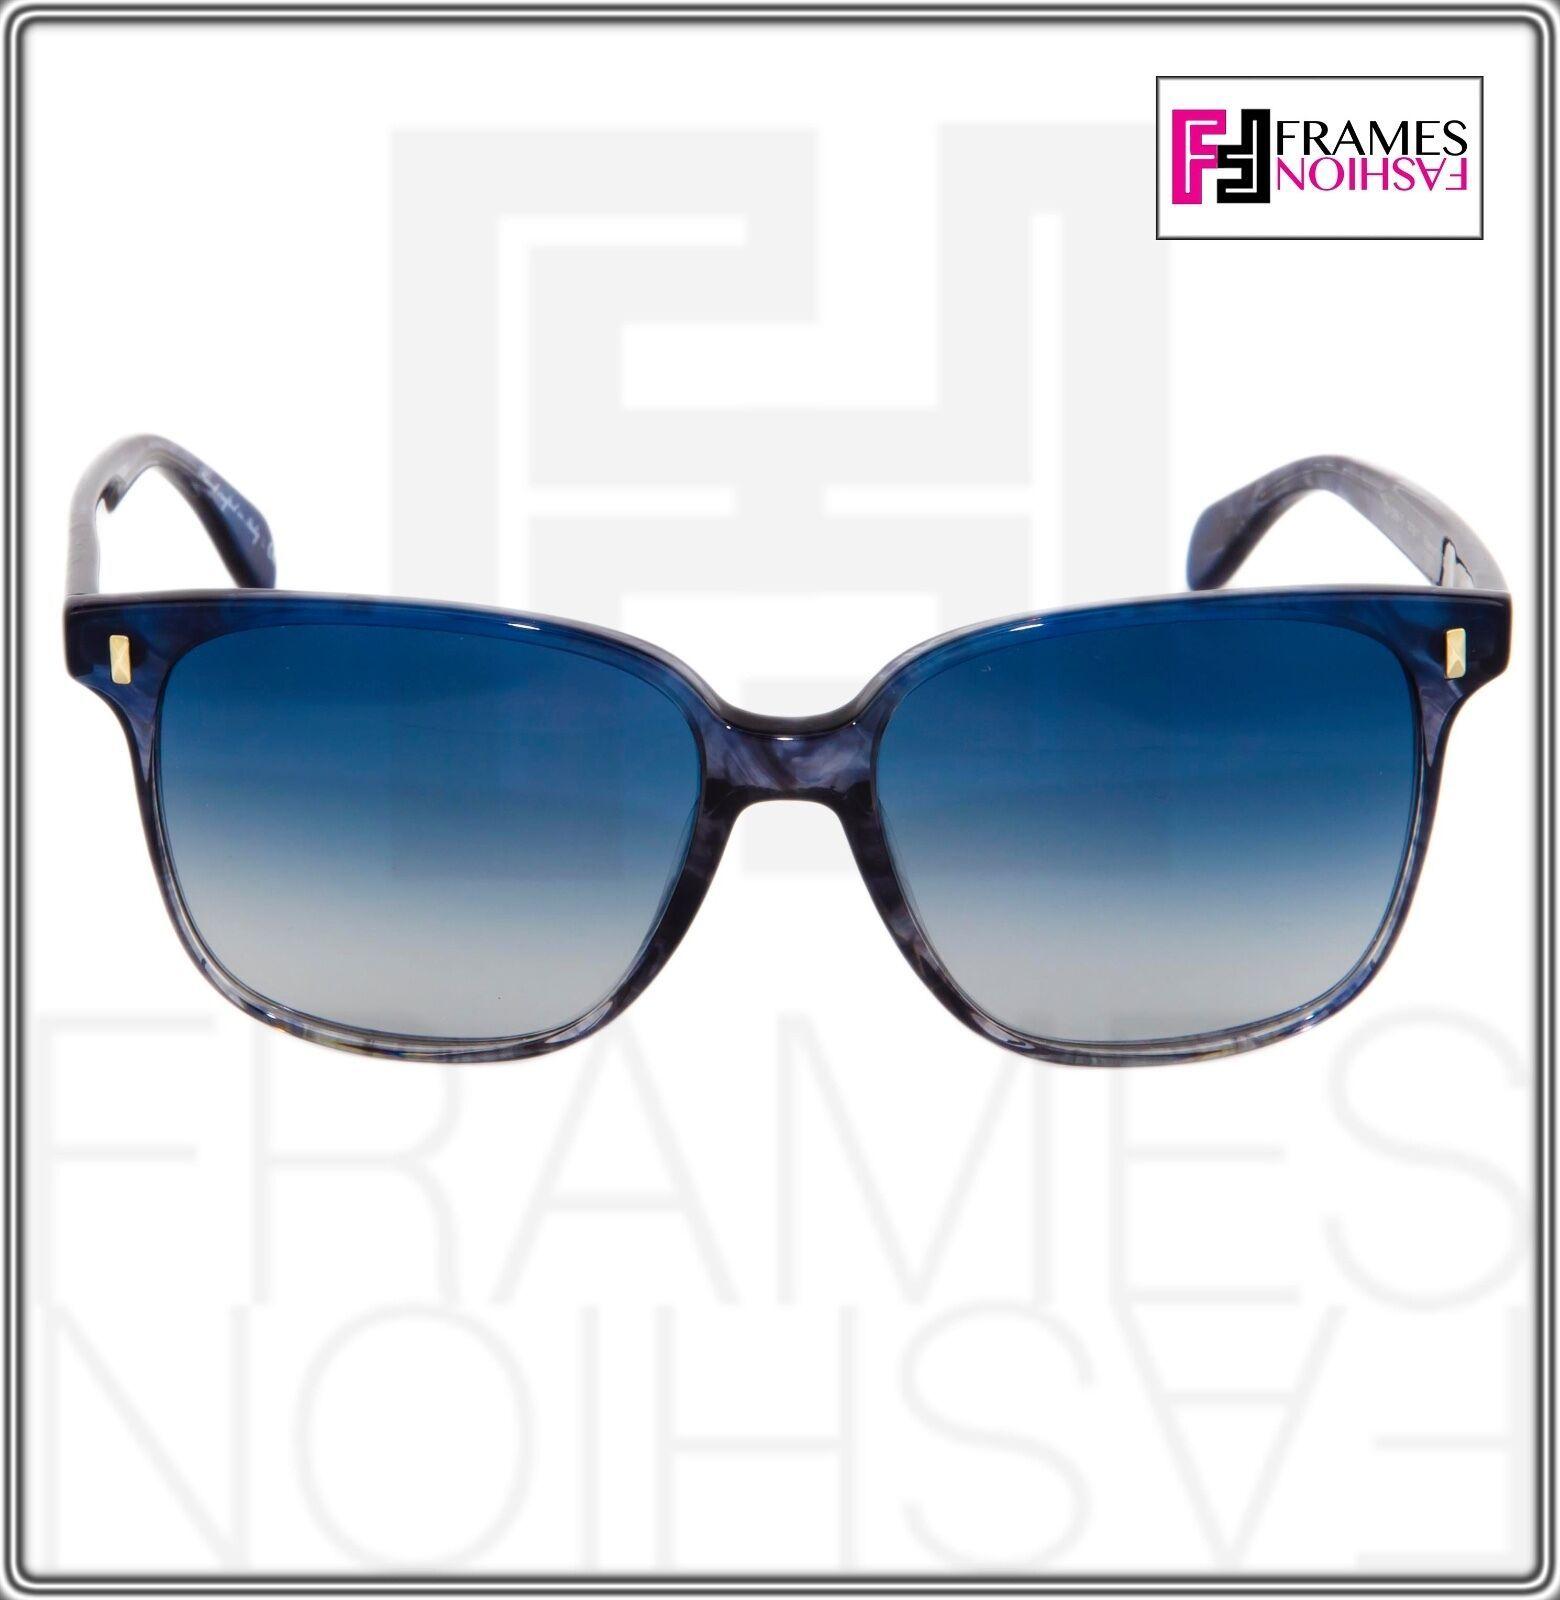 OLIVER PEOPLES MARMOT Square OV5266S Faded Sea Pacific Blue Sunglasses 5266 image 8